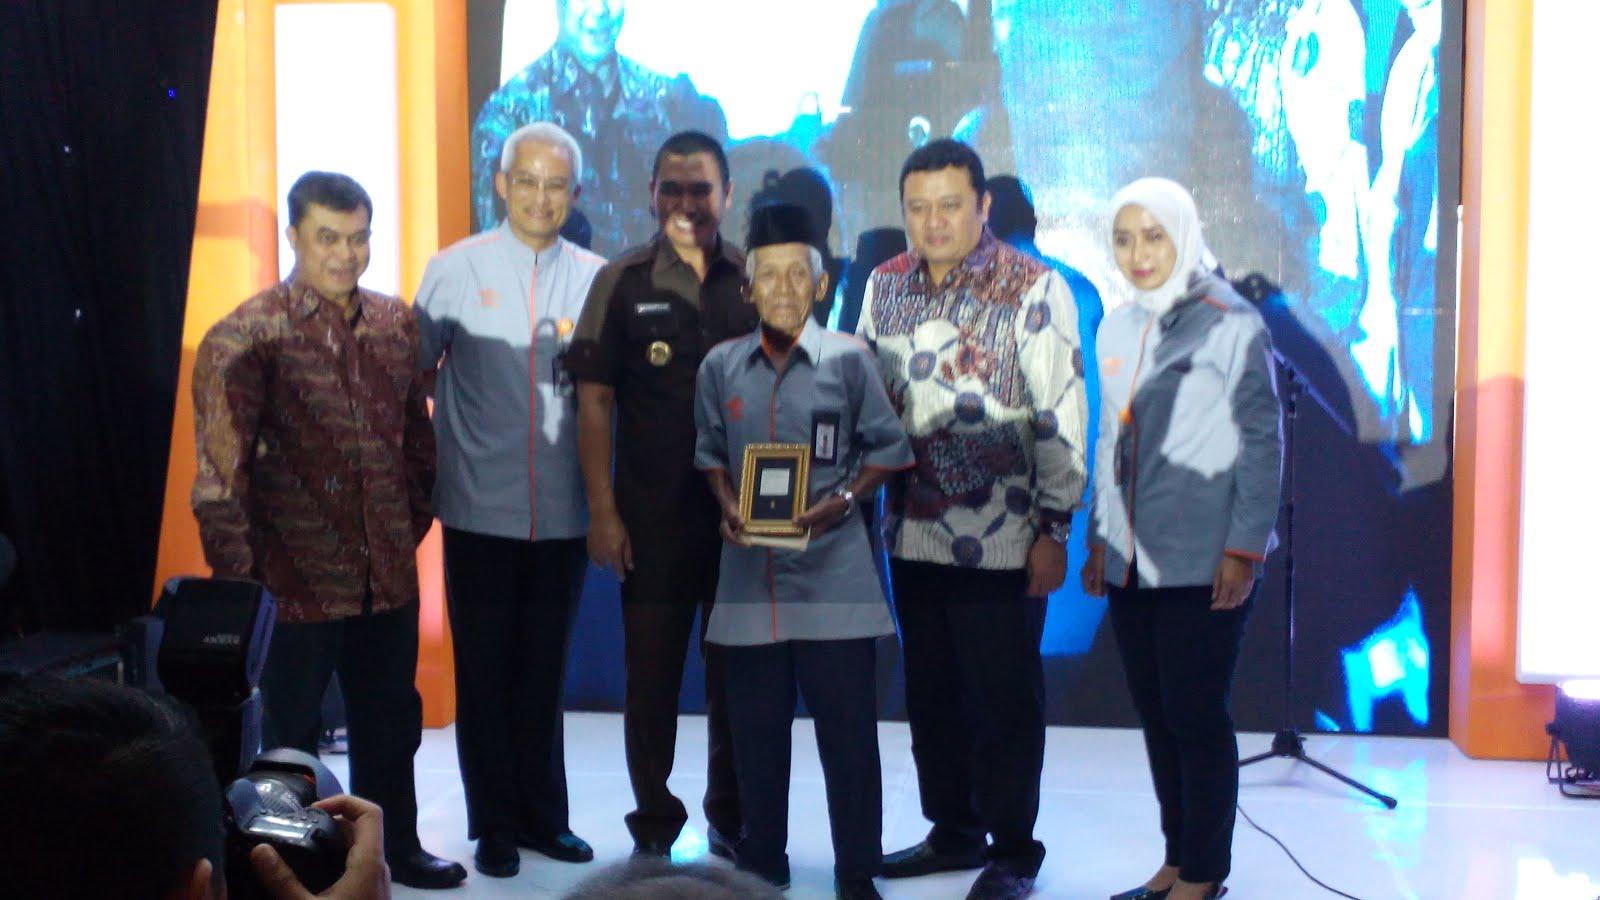 Permudah Investasi Emas Pt Antam Dan Pt Pos Indonesia Jalin Mou